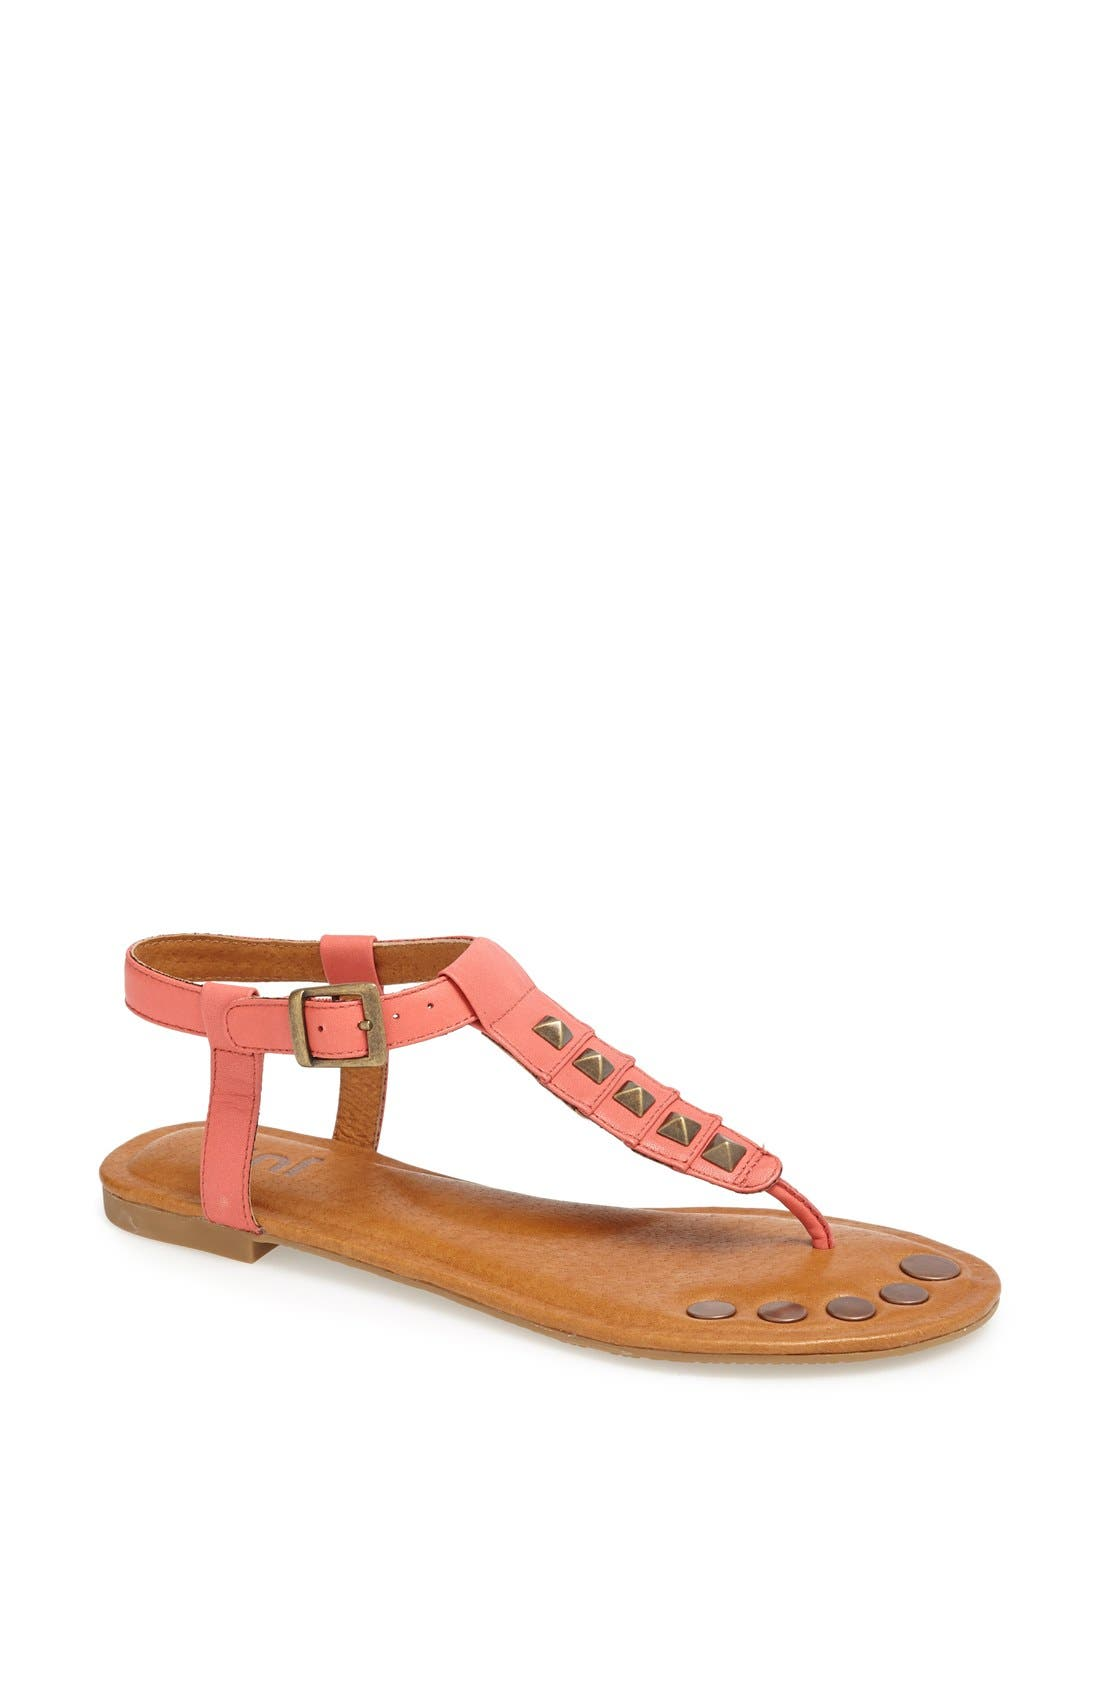 Main Image - Juil 'Kava' Grounded Leather Sandal